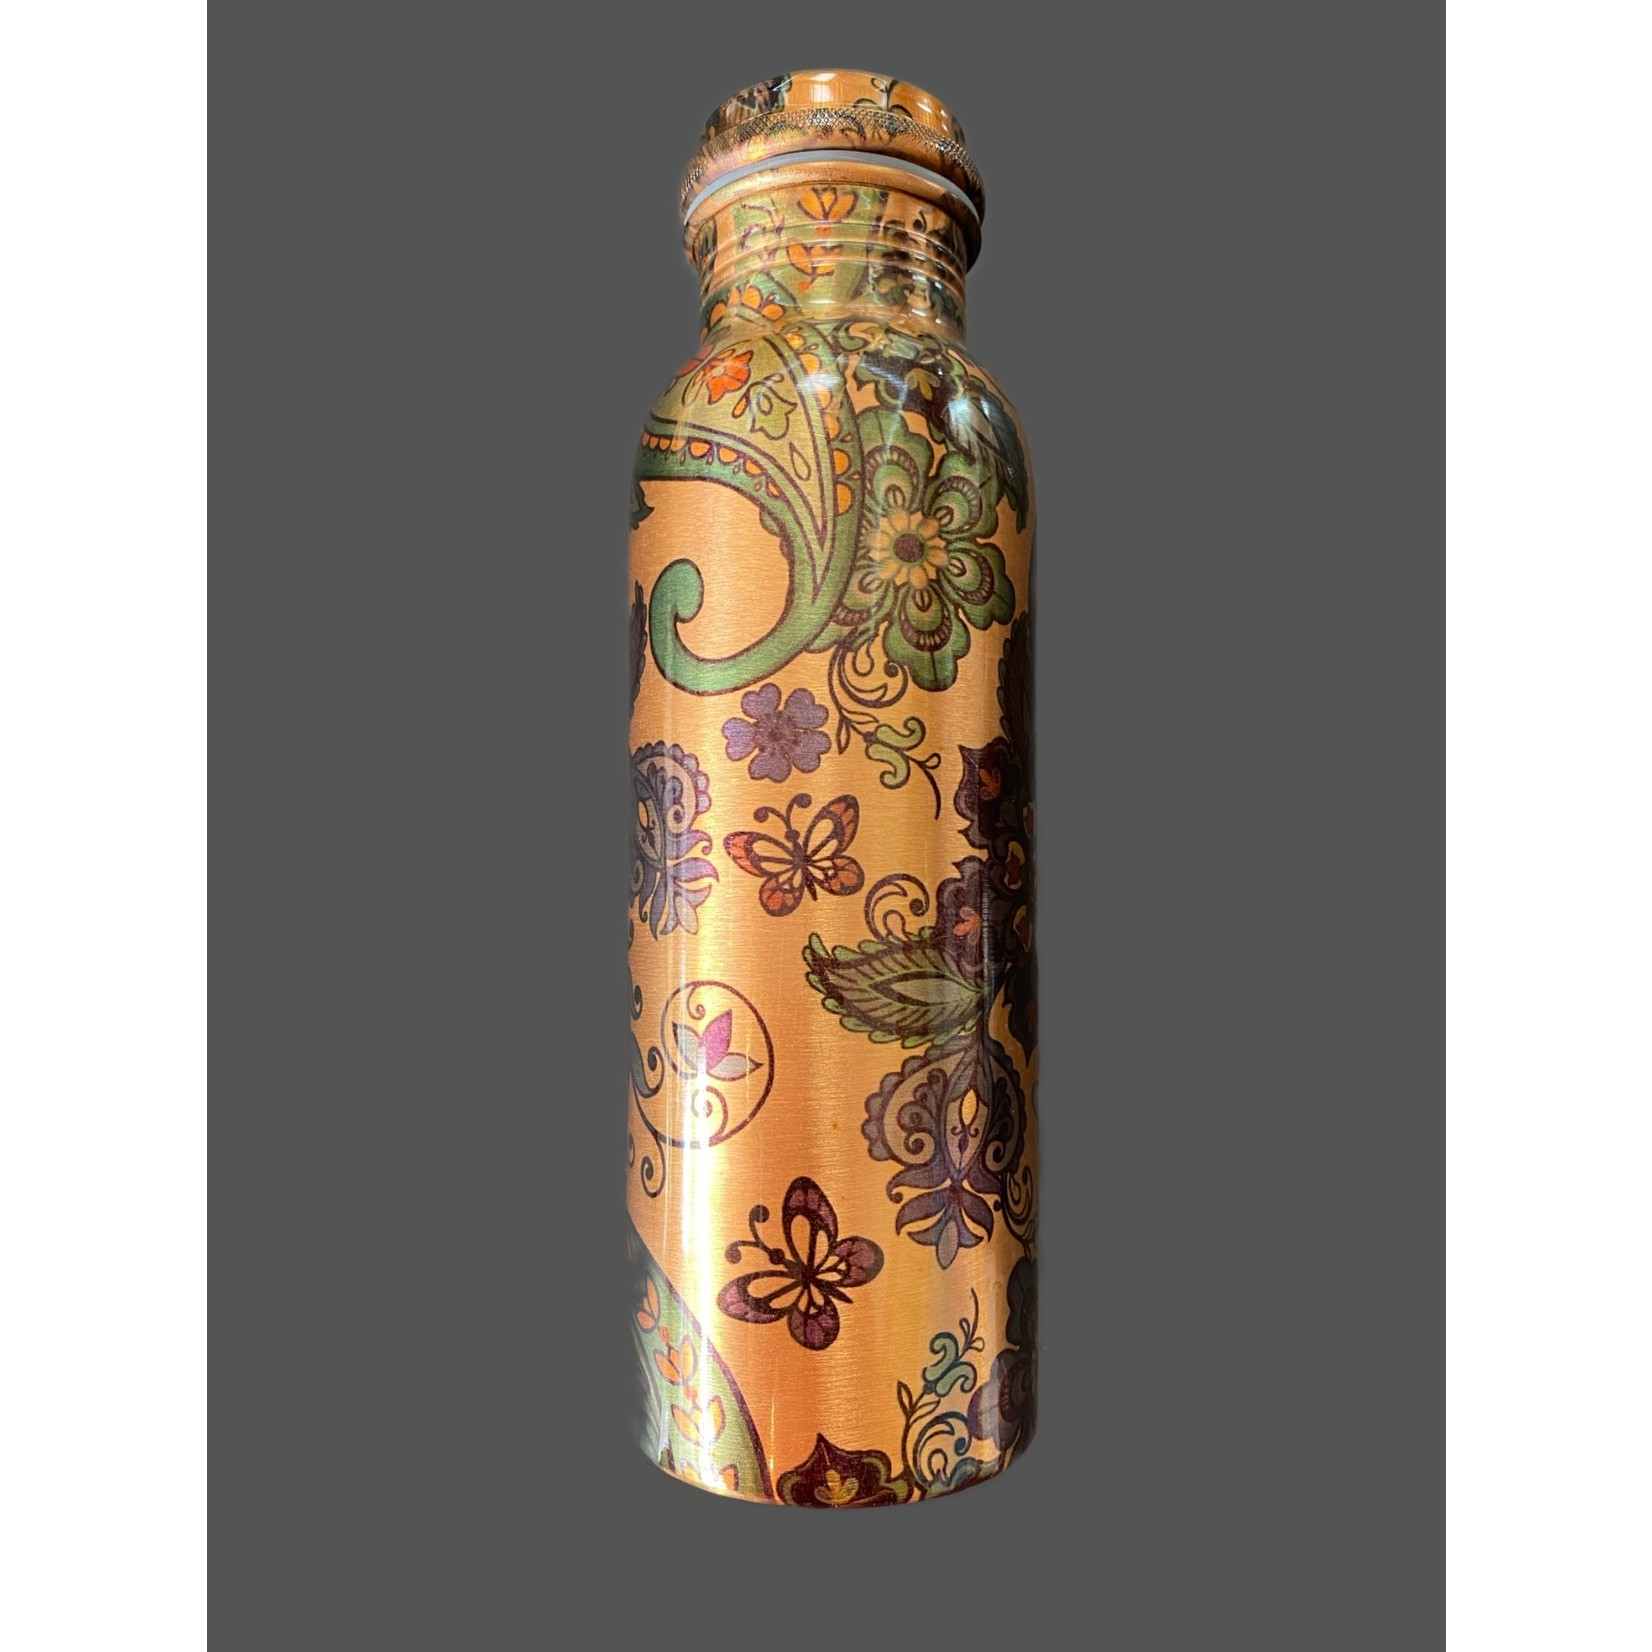 Botella de cobre diseño de cachemira imprimido 750 ml